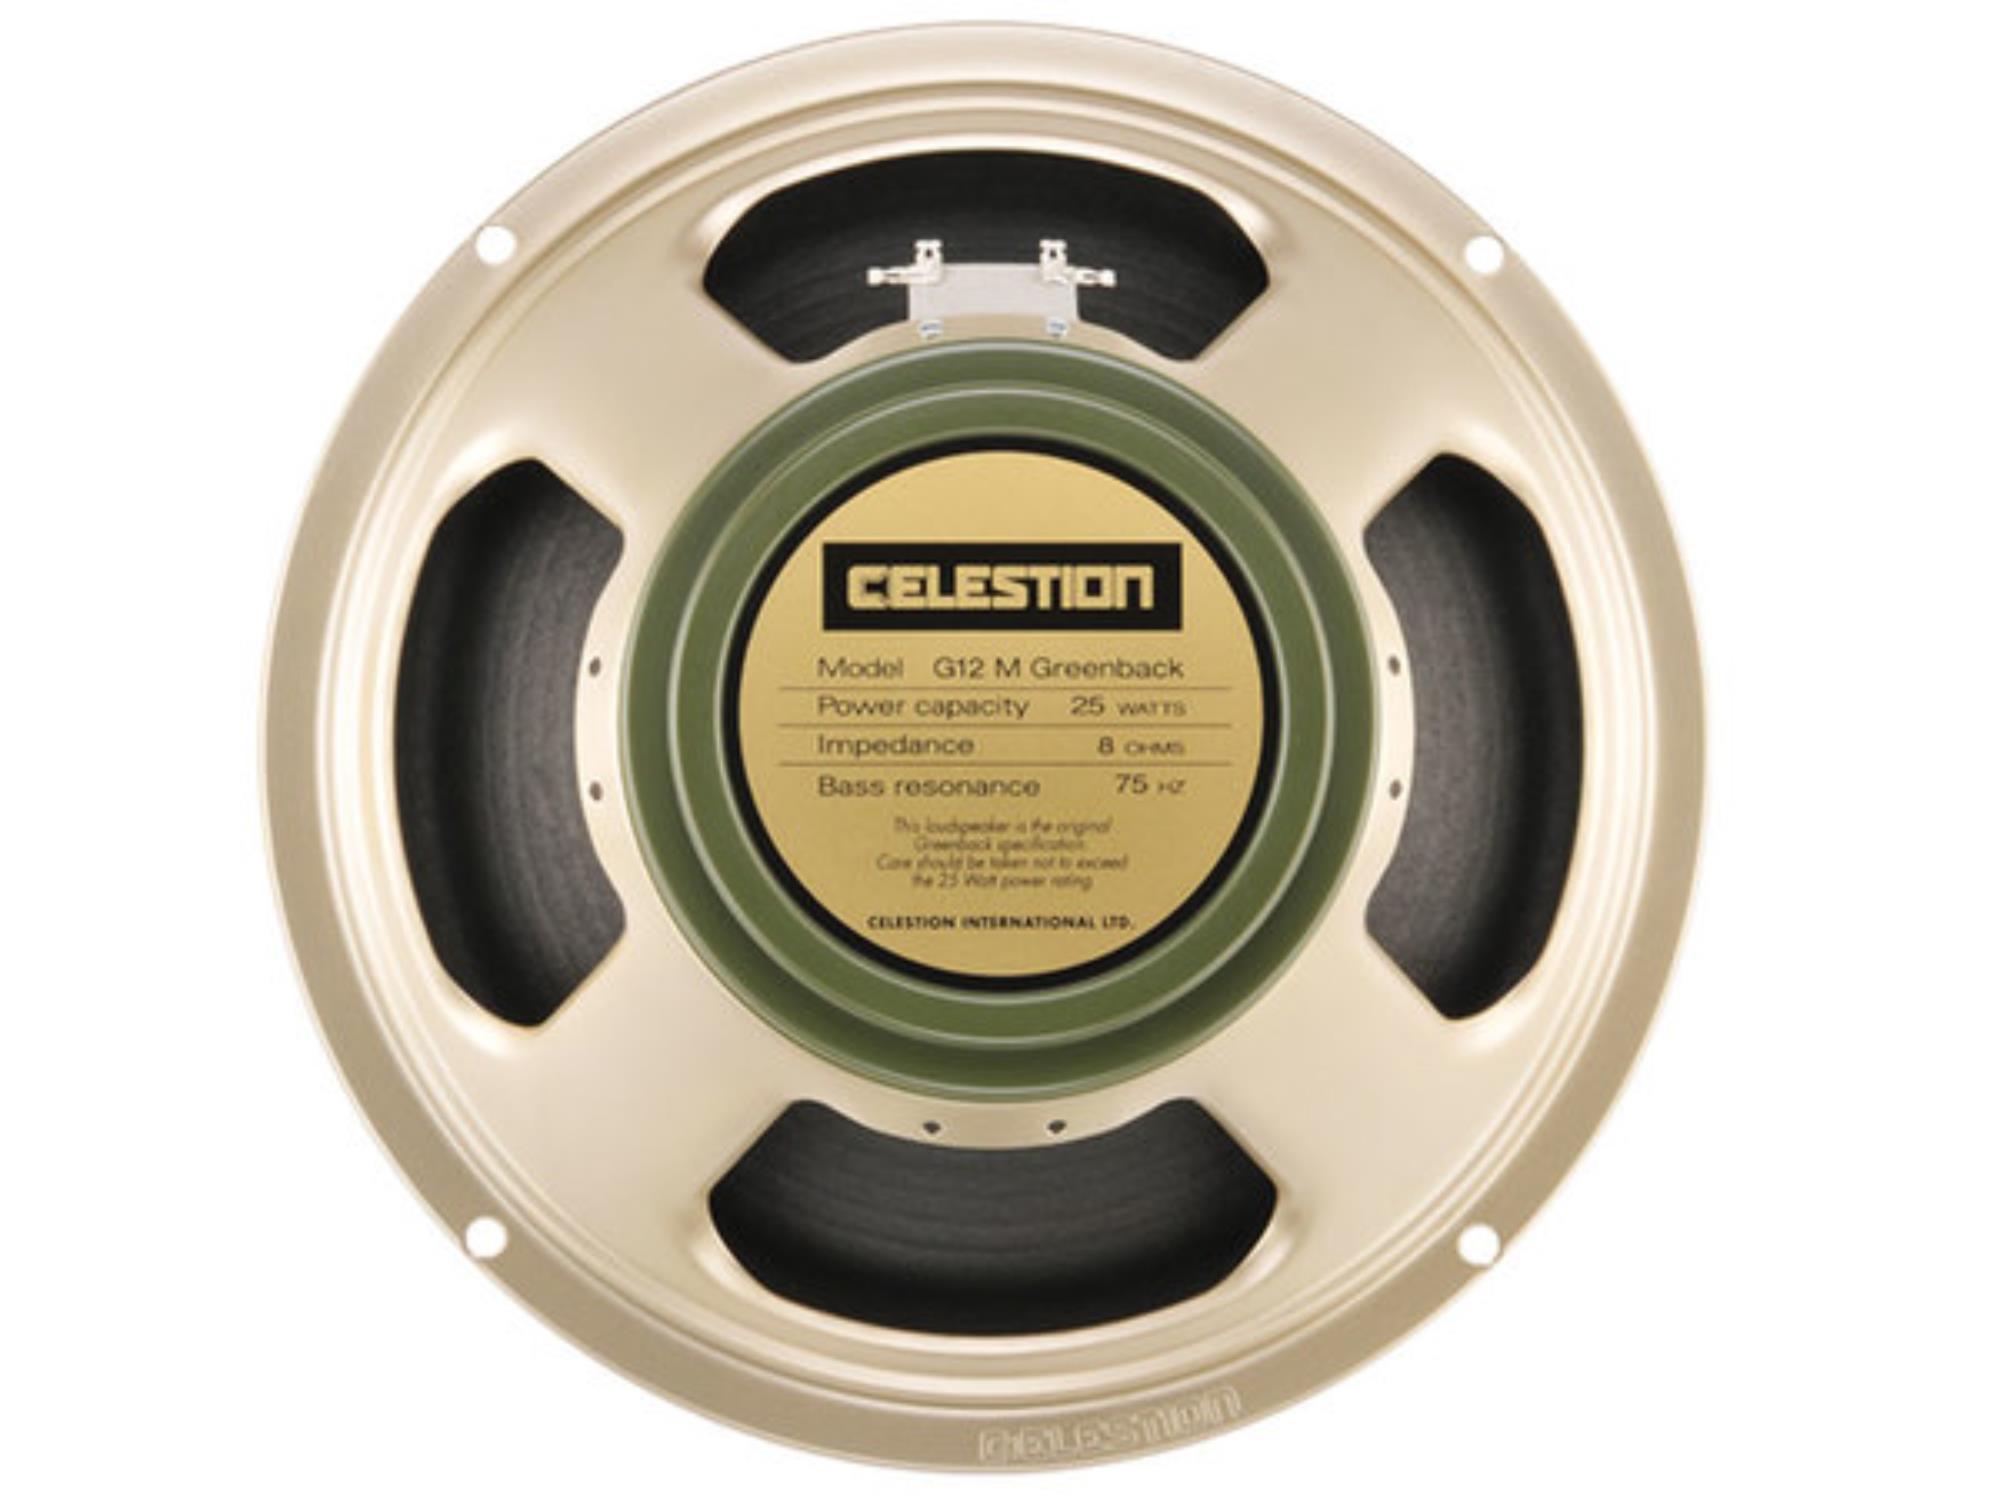 CELESTION-CLASSIC-G12M-GREENBACK-8-OHM-sku-24539